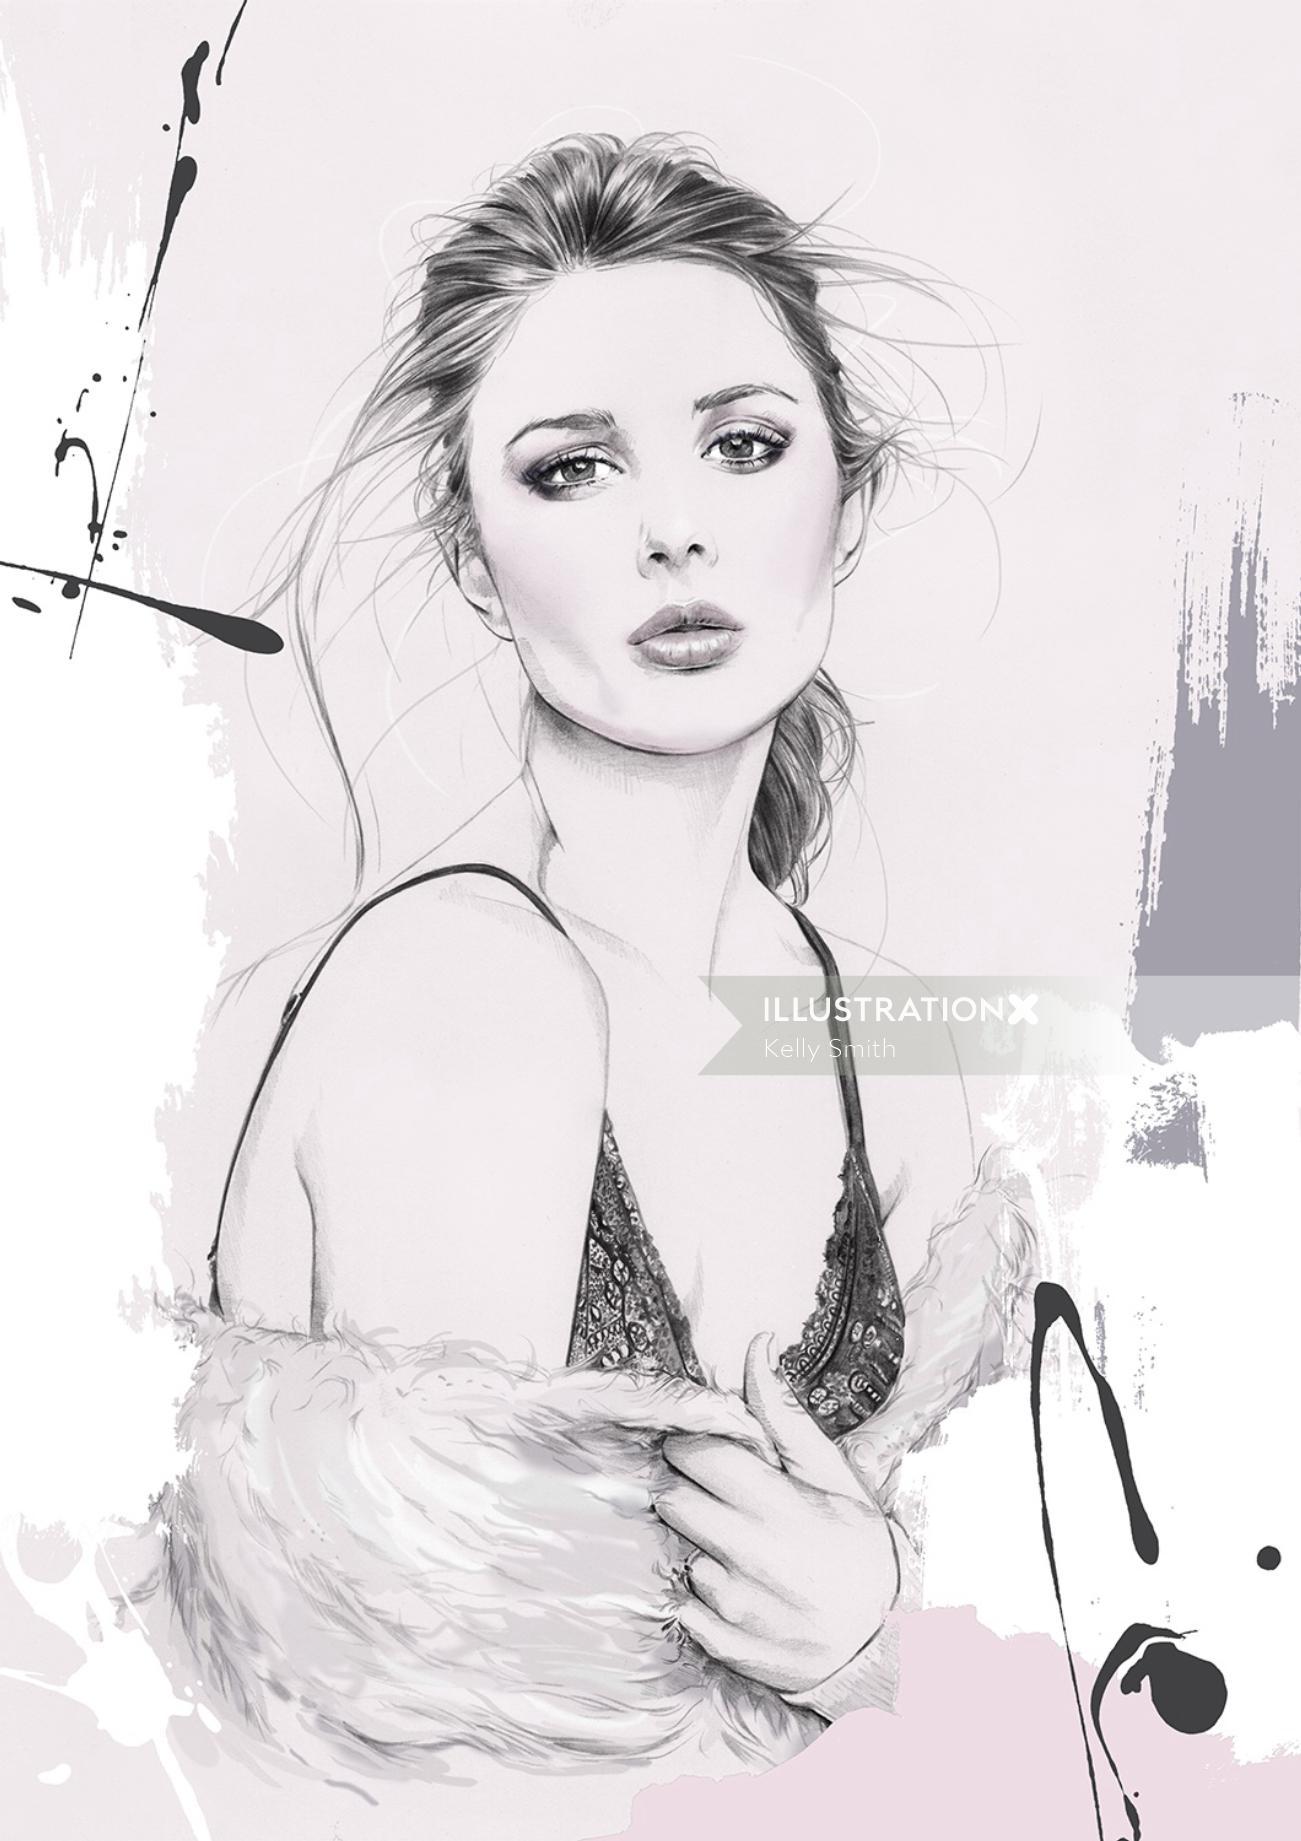 Illustration of Zanita Whittington